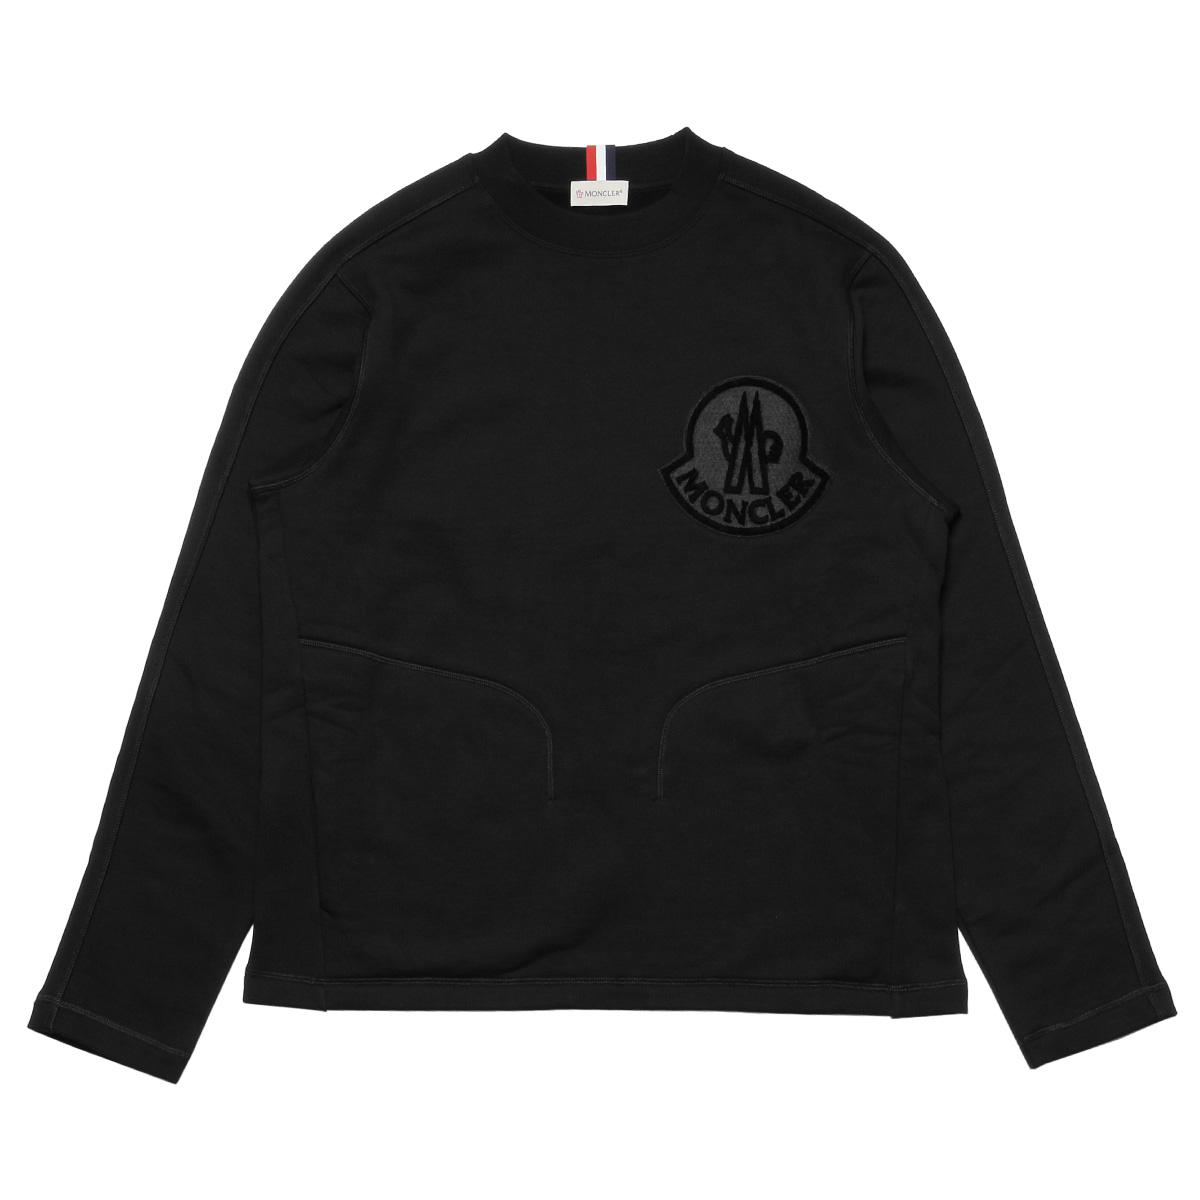 22cf0fd00f74 8035300 Monk rail MONCLER sweat shirt men 80451 999 long sleeves sweat  shirt BLACK black